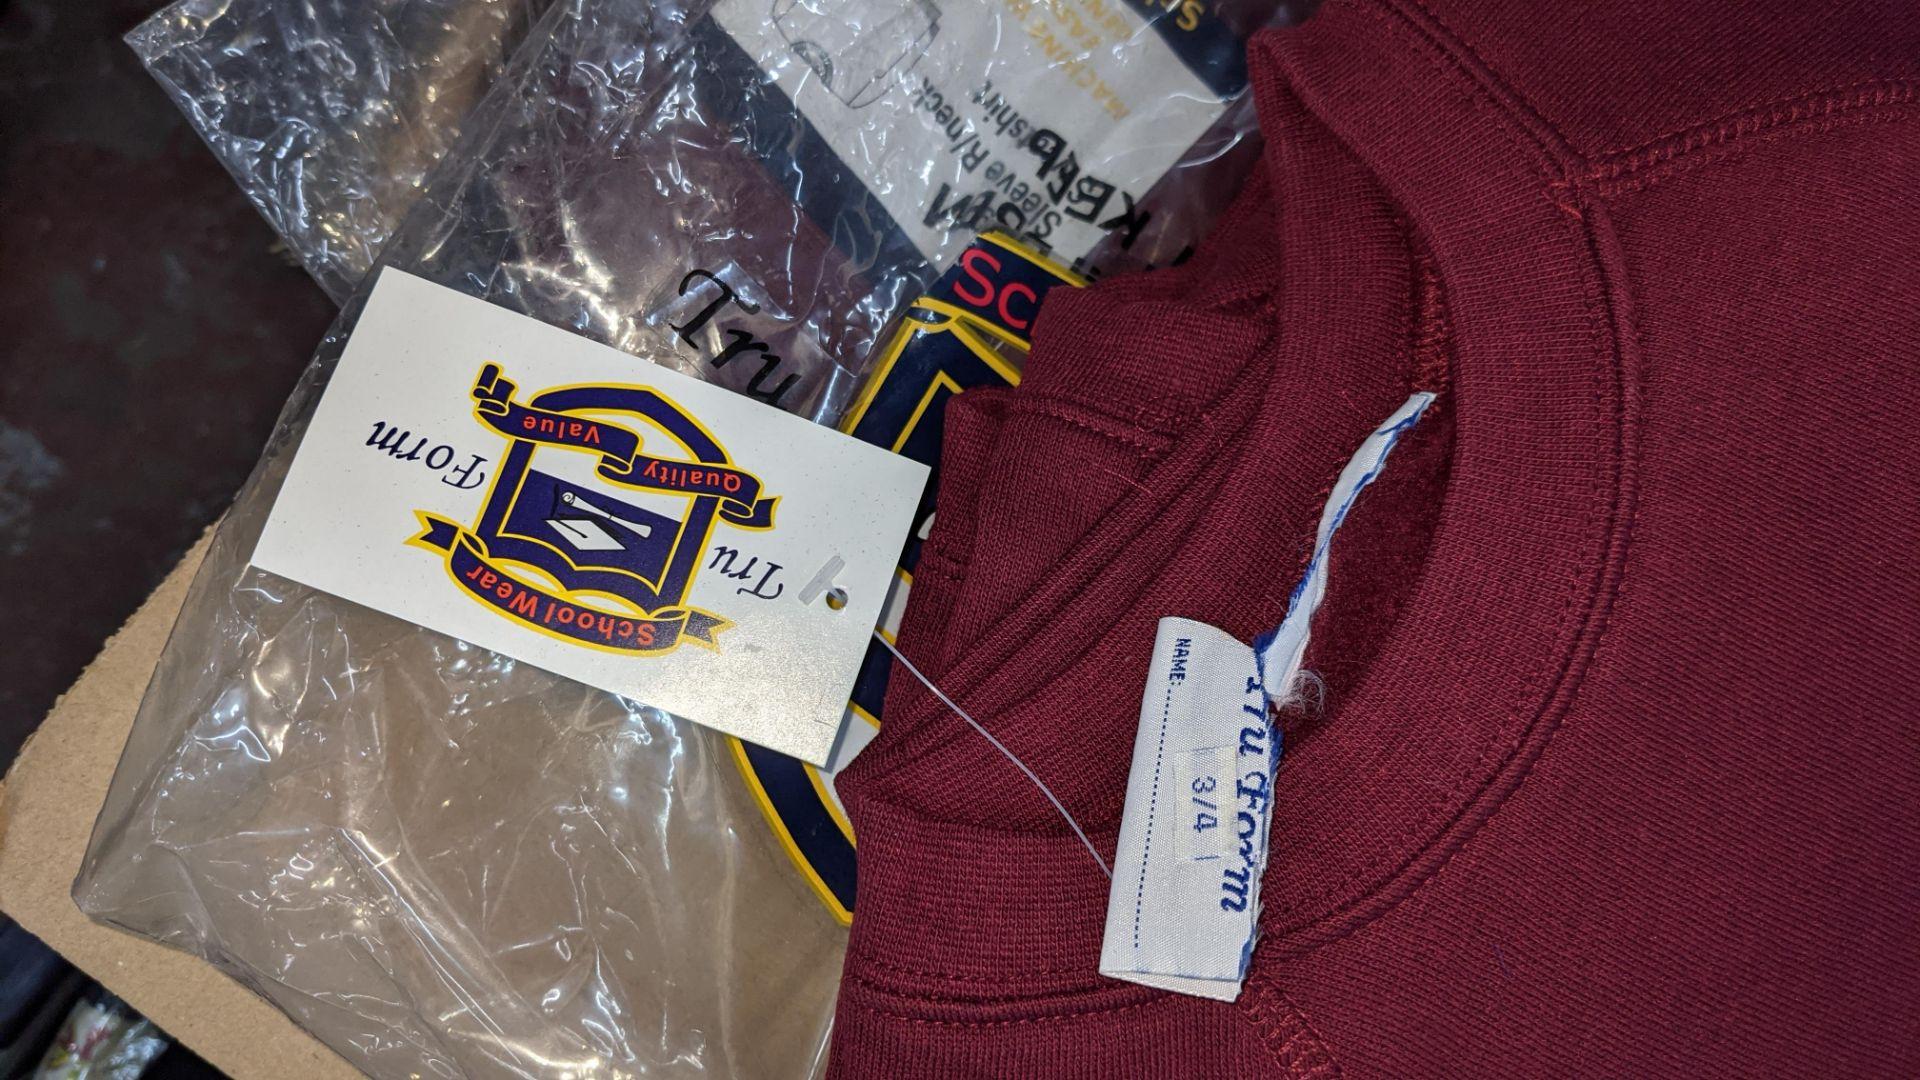 Approx 36 off children's burgundy sweatshirts - 1 large box - Image 4 of 4